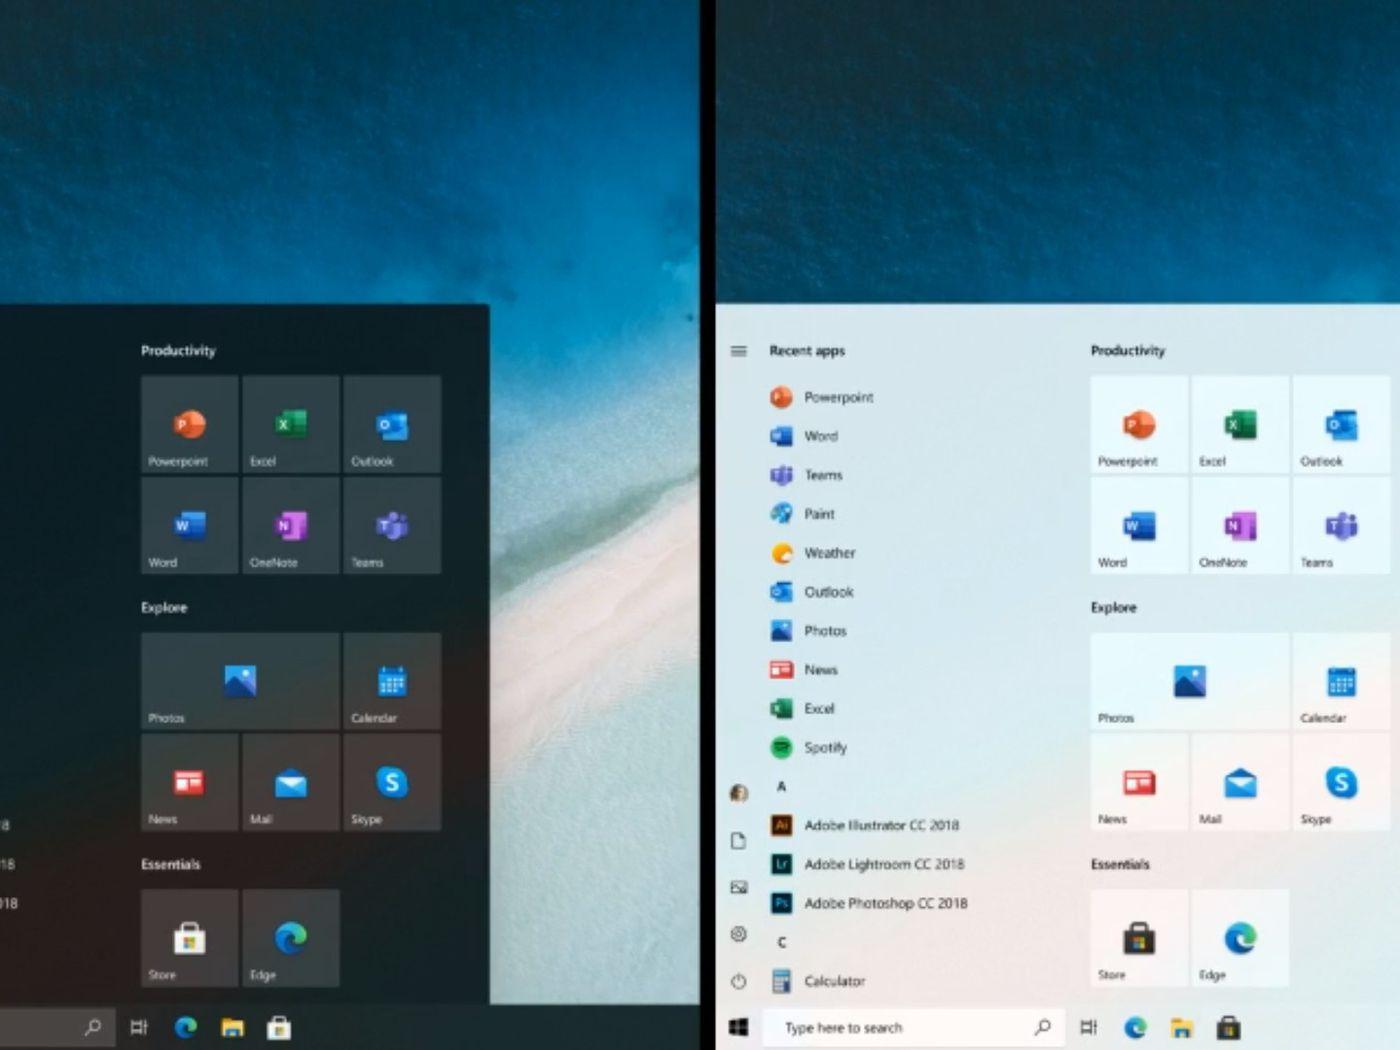 Microsoft Teases New Windows 10 Start Menu That De Emphasizes Live Tiles The Verge